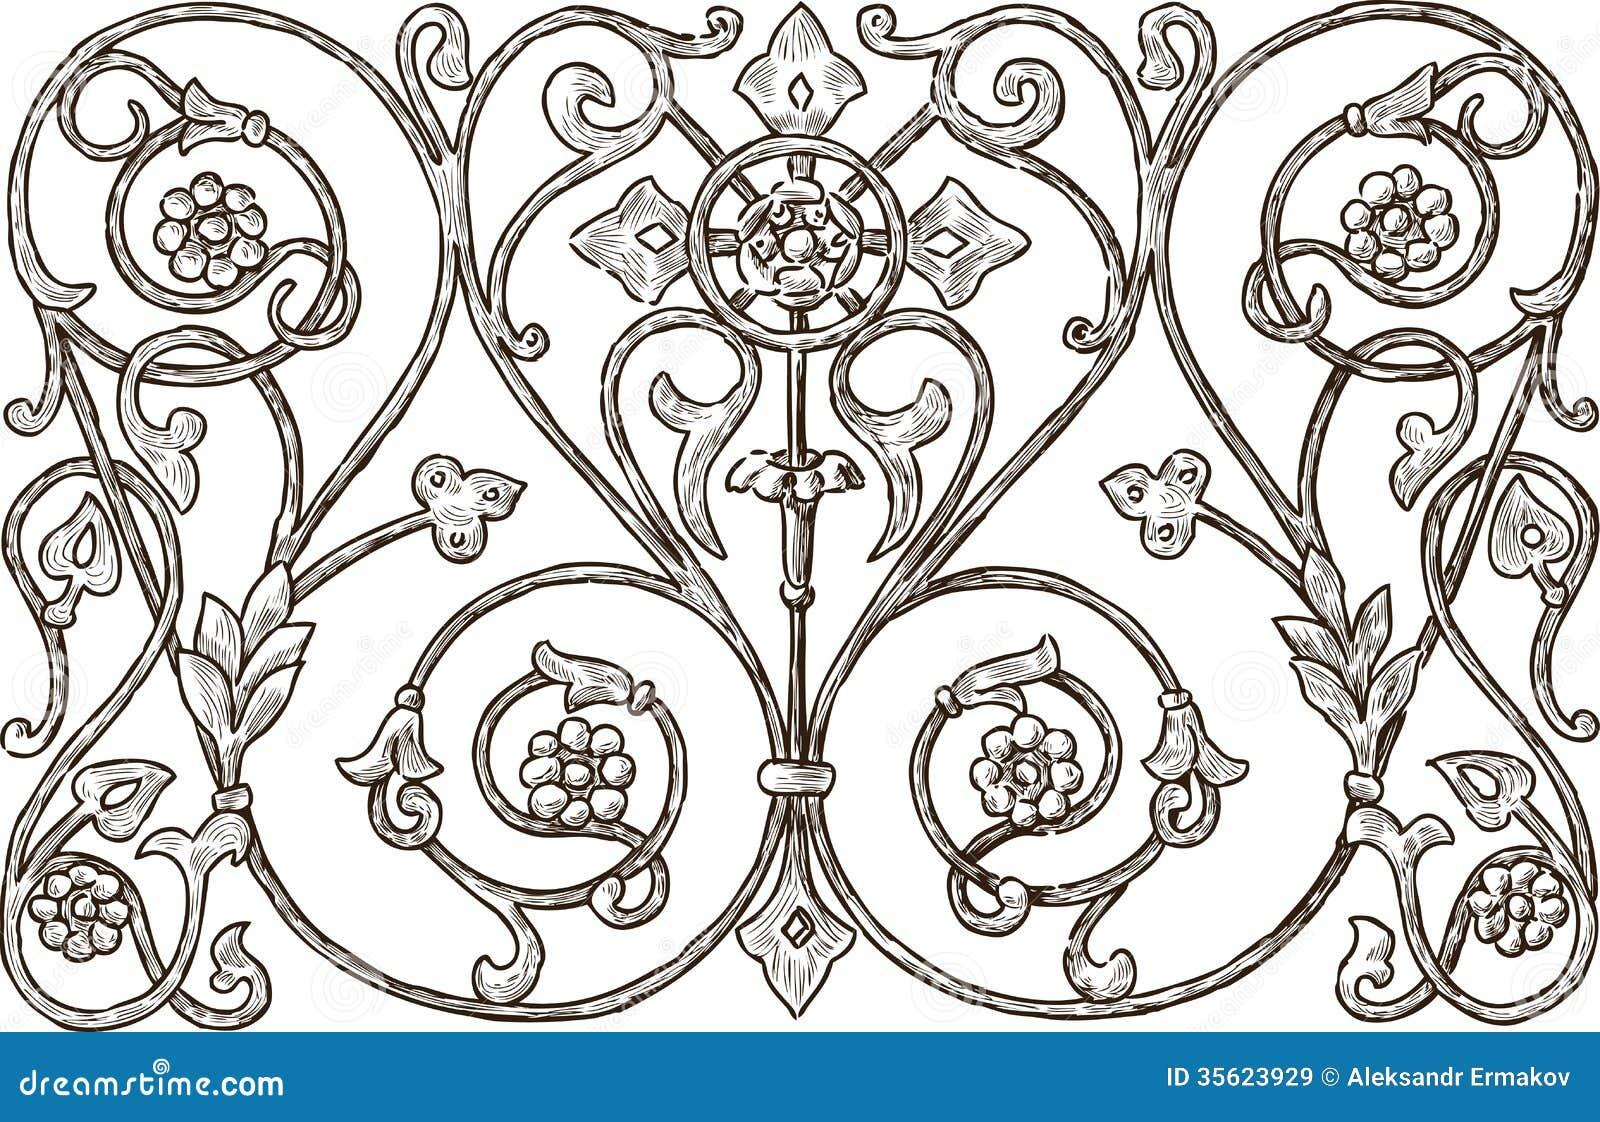 Decorative Element Royalty Free Stock Images Image 35623929